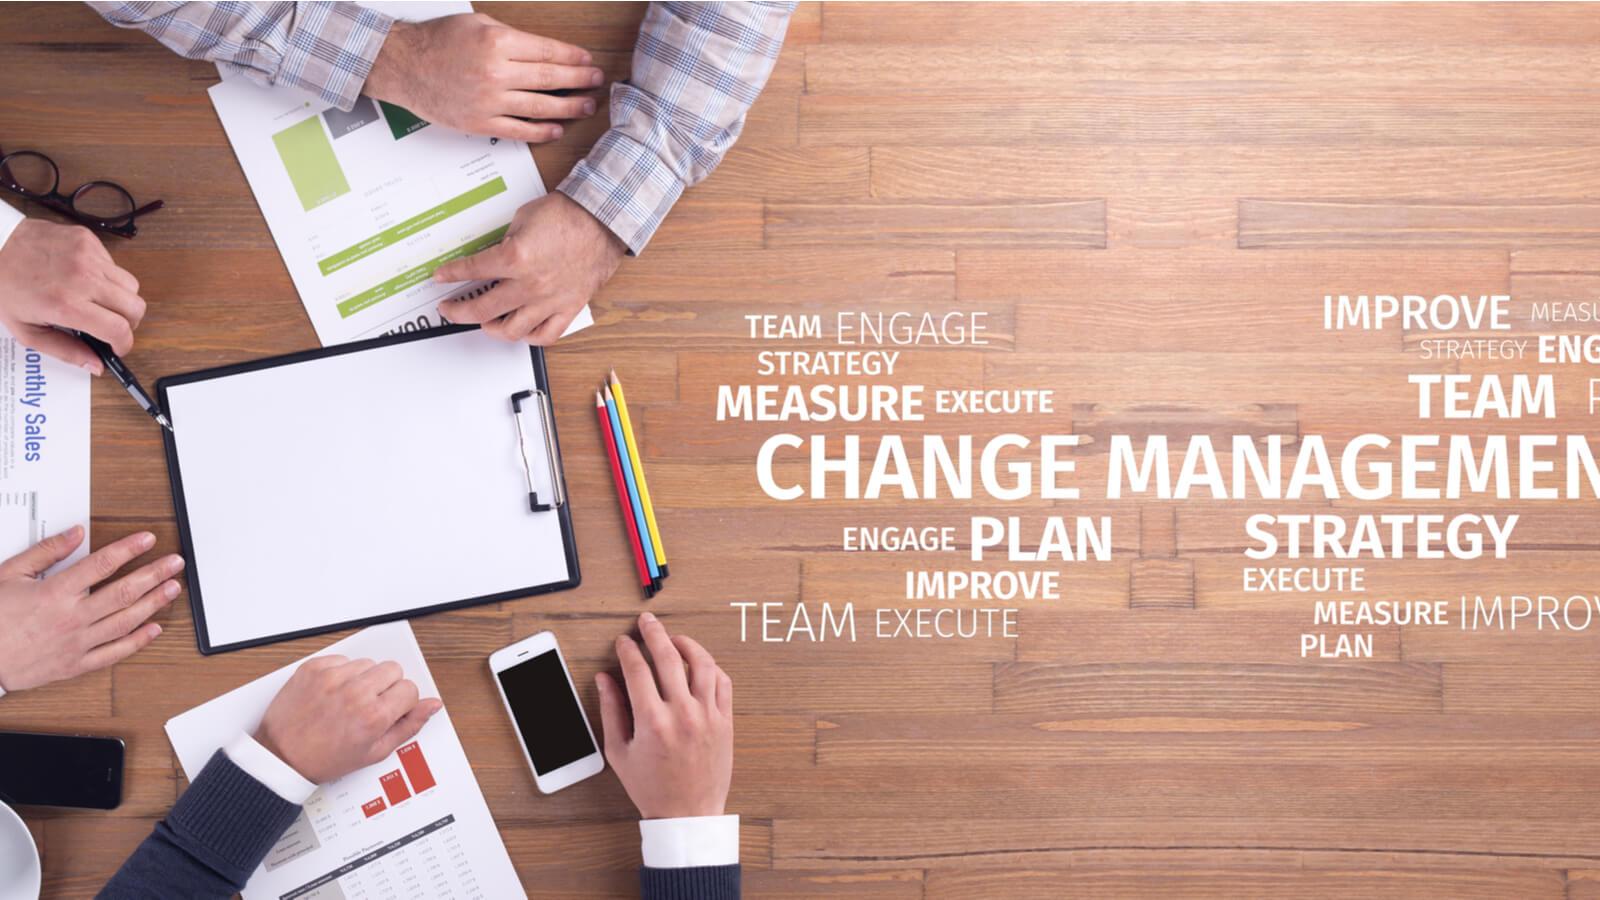 Building an Adaptable Team That Embraces Change Management (1)